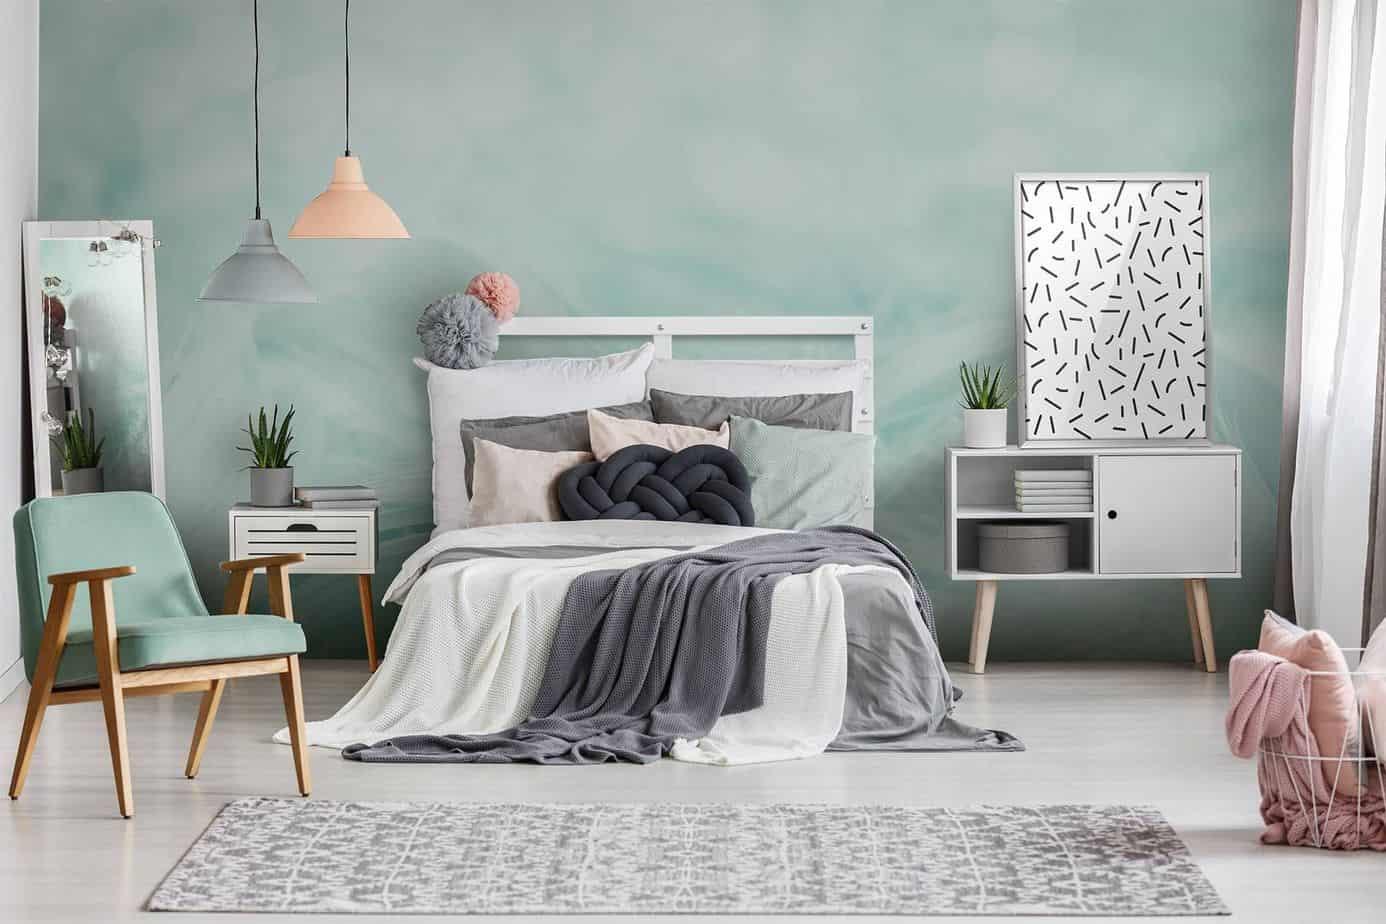 trending bedroom colors 2021 soft pastels green, blue interior